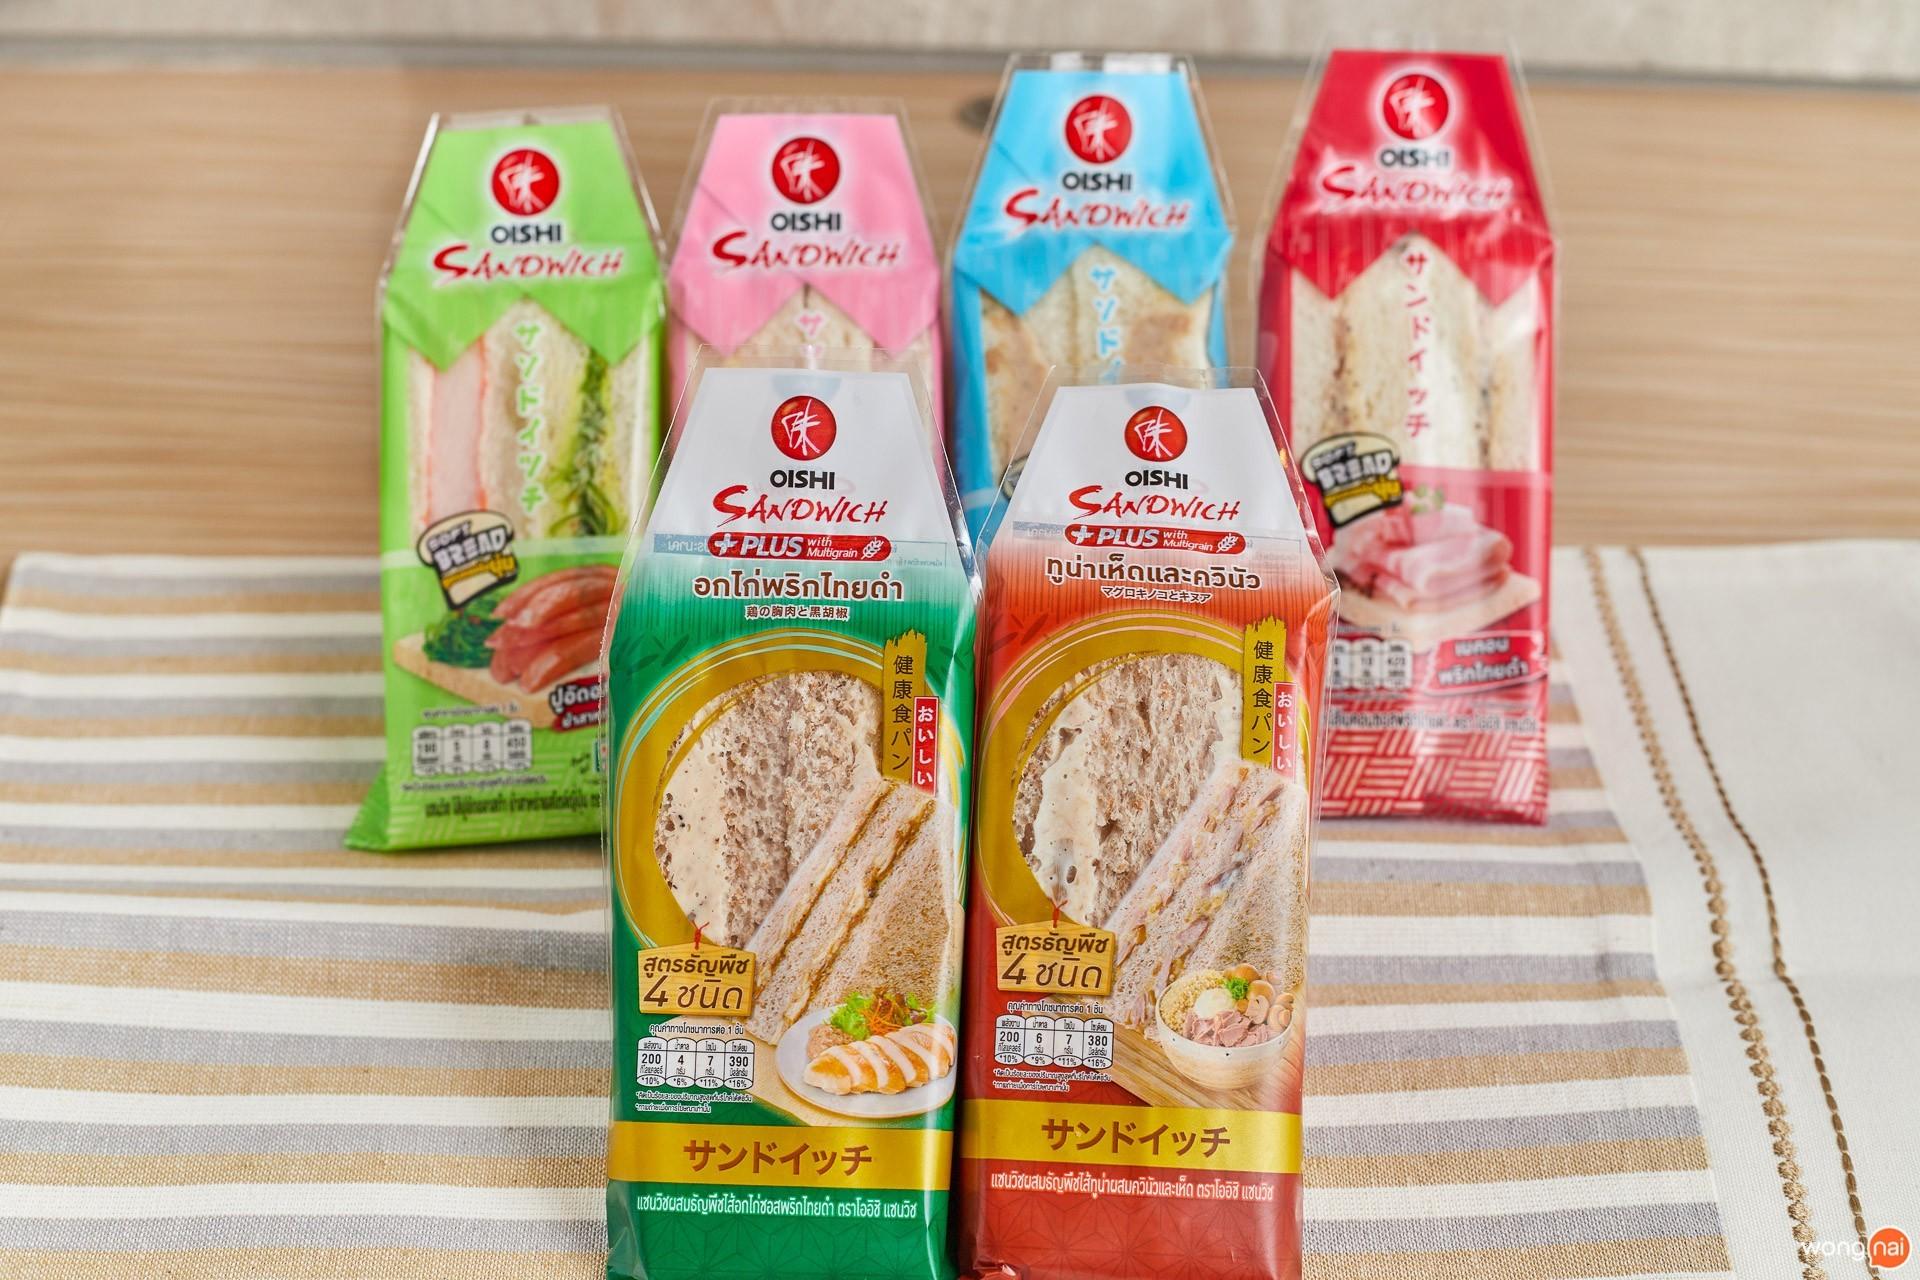 Oishi Sandwich Plus โออิชิ แซนด์วิช